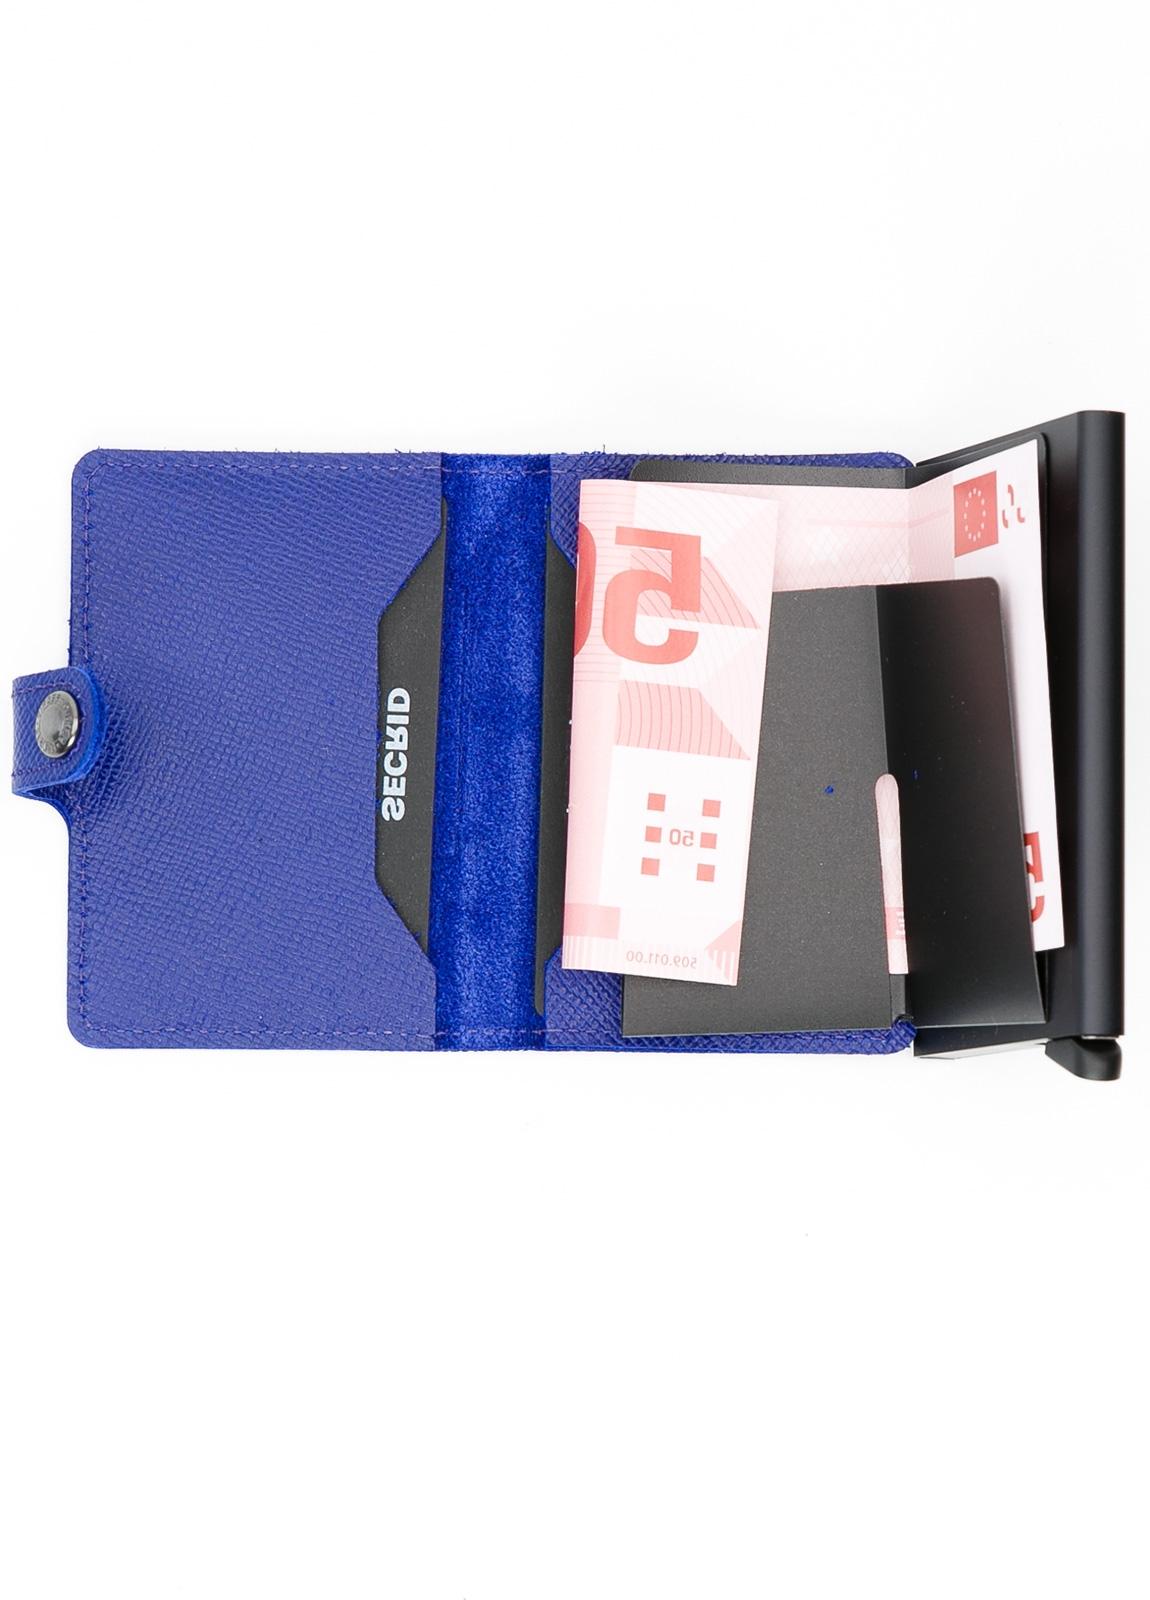 Secrid MINIWALLET. Piel color azul tinta, con cardprotector de aluminio ultrafino. - Ítem1